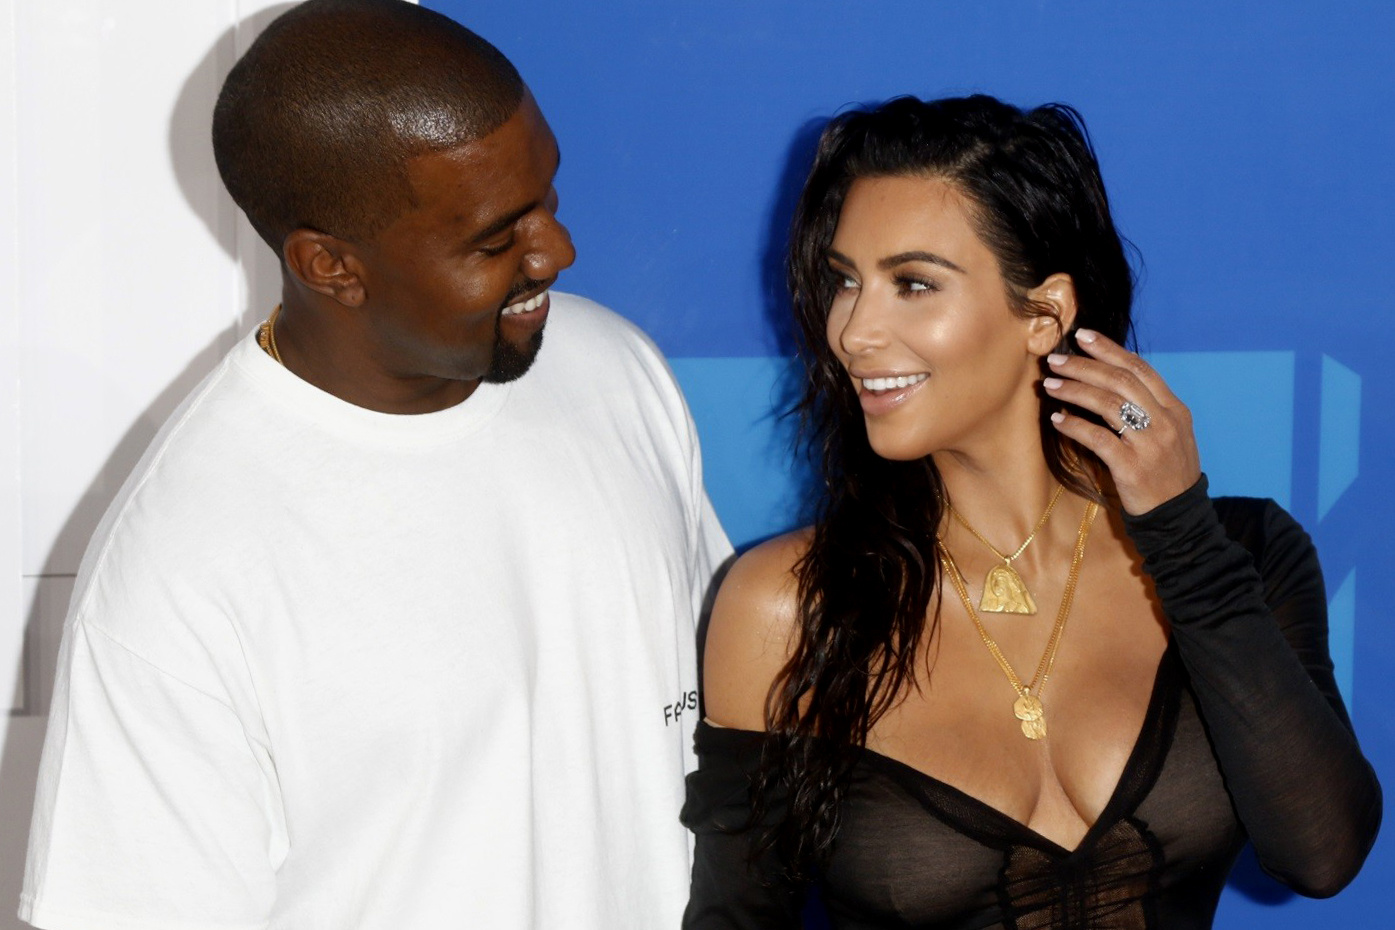 That Big Diamond Ring Kanye West Gave to Kim Kardashian Is a Funny Story